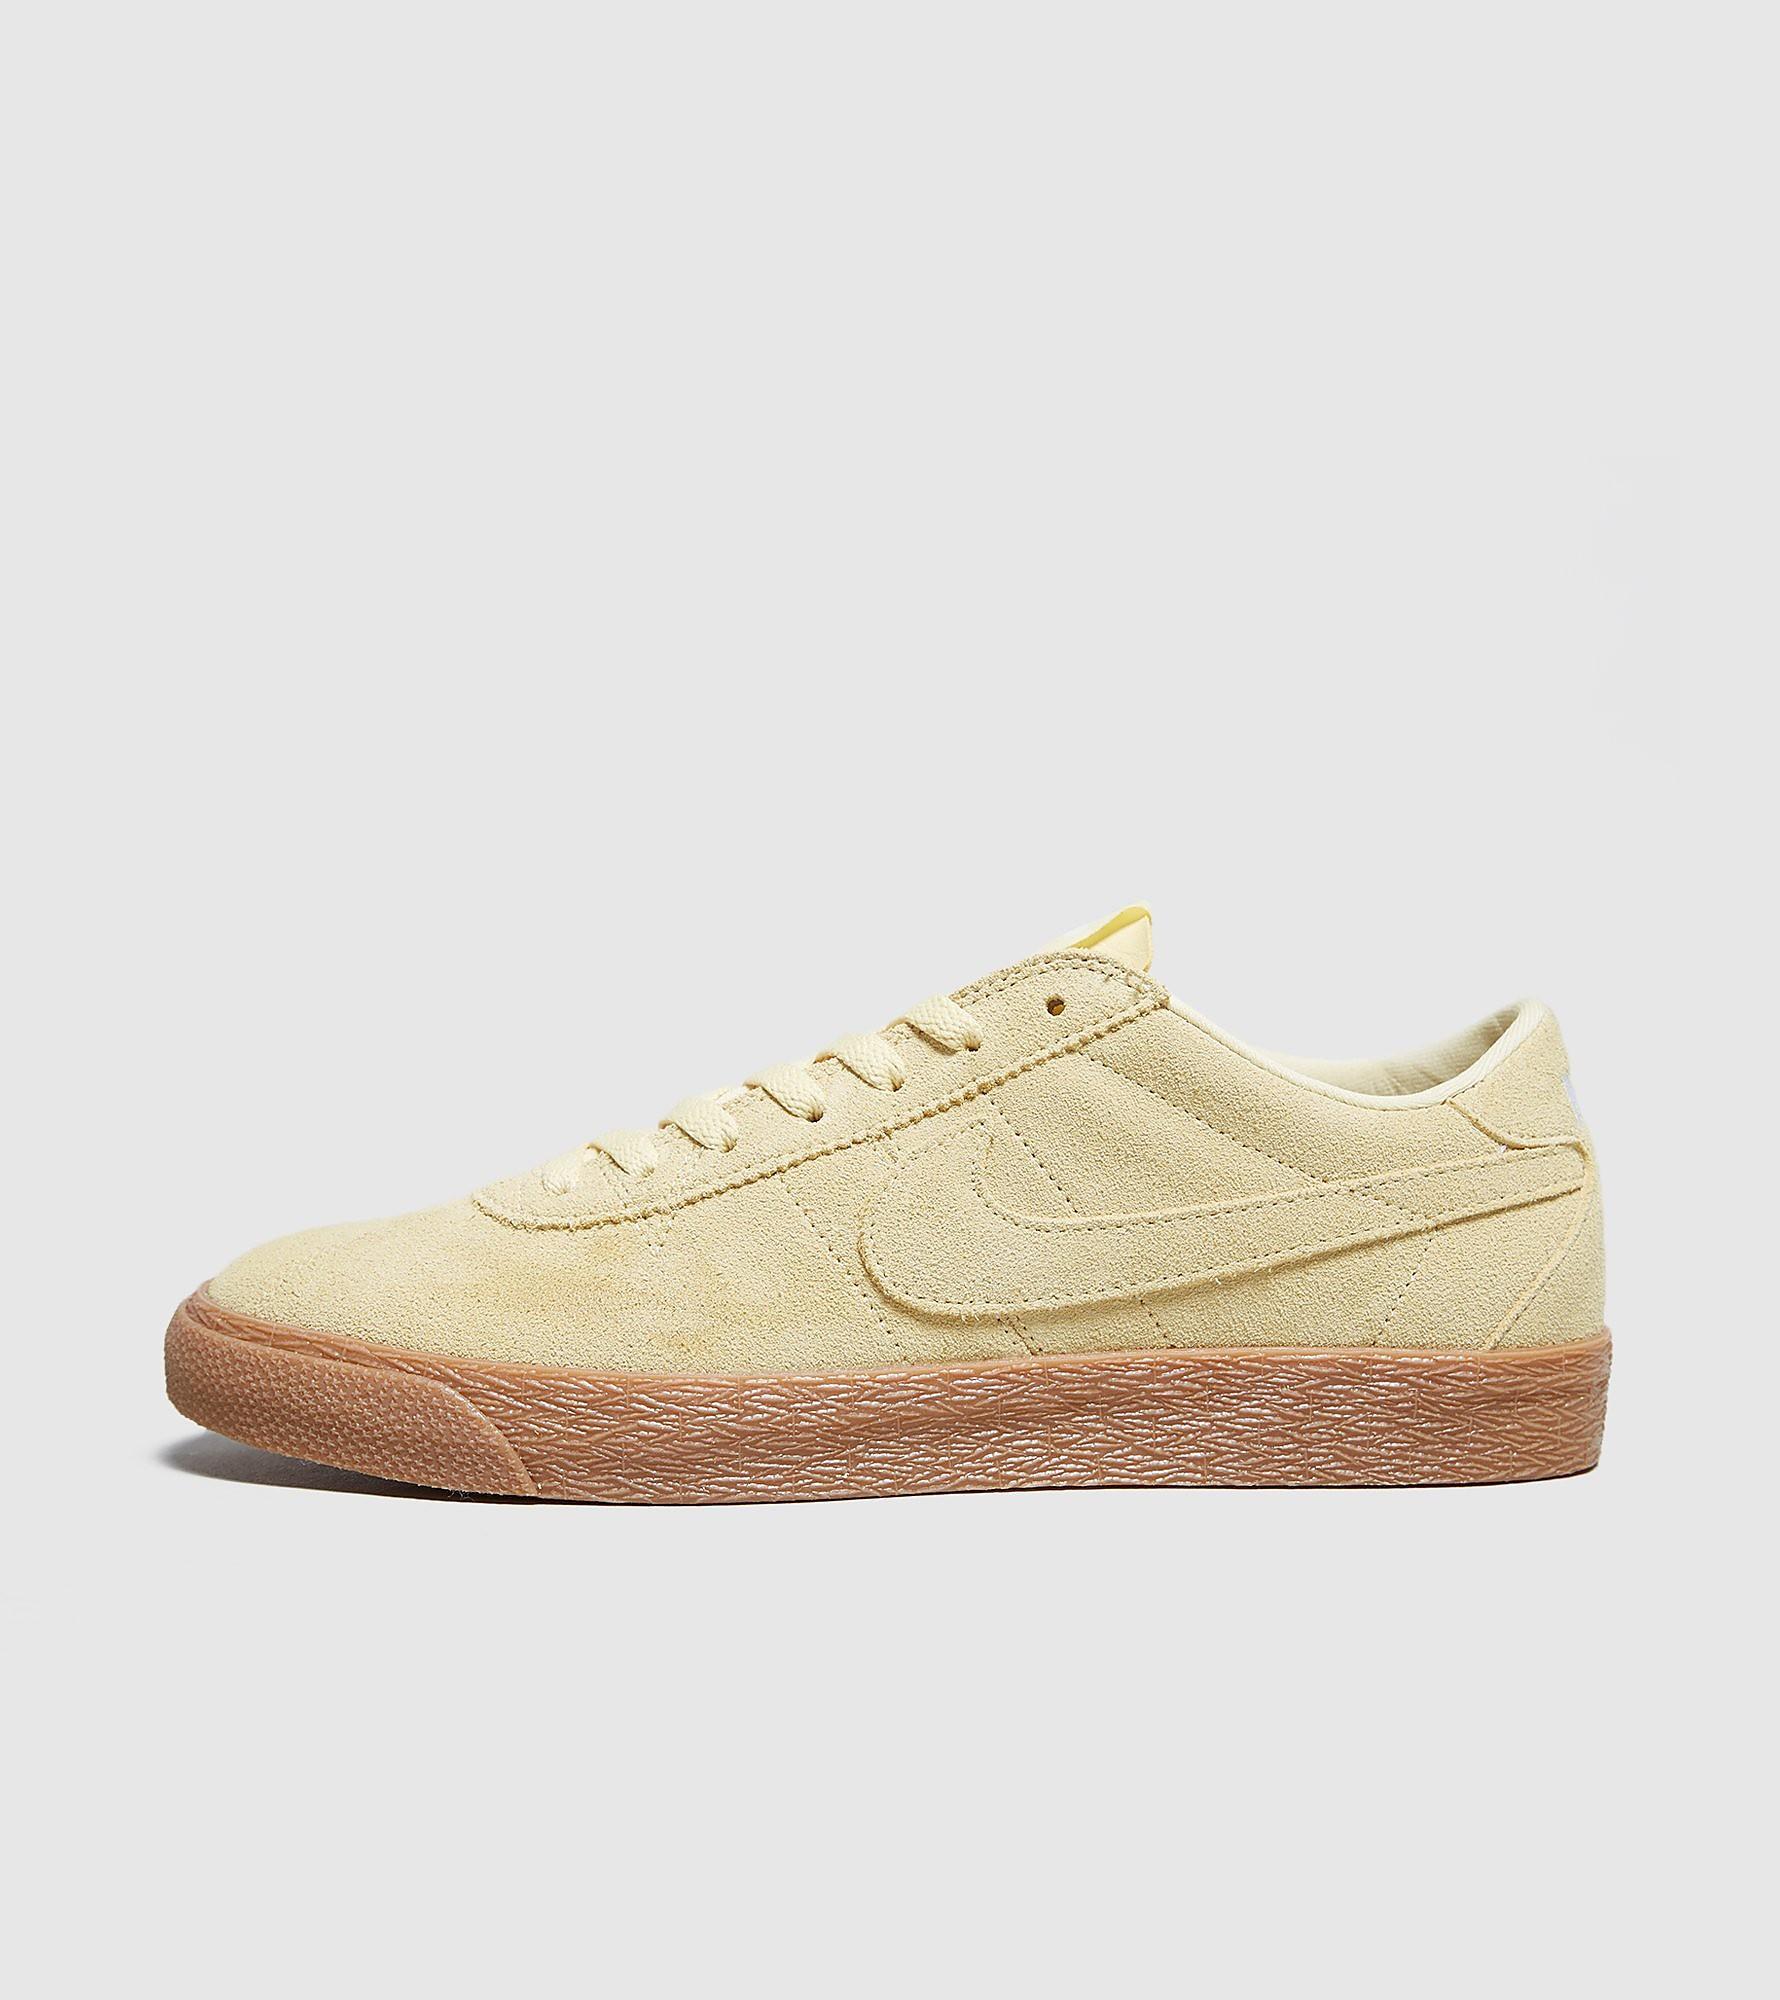 save off 5f8ee 1bcbf 38% Nike SB Zoom Bruin Premium SE, Beige